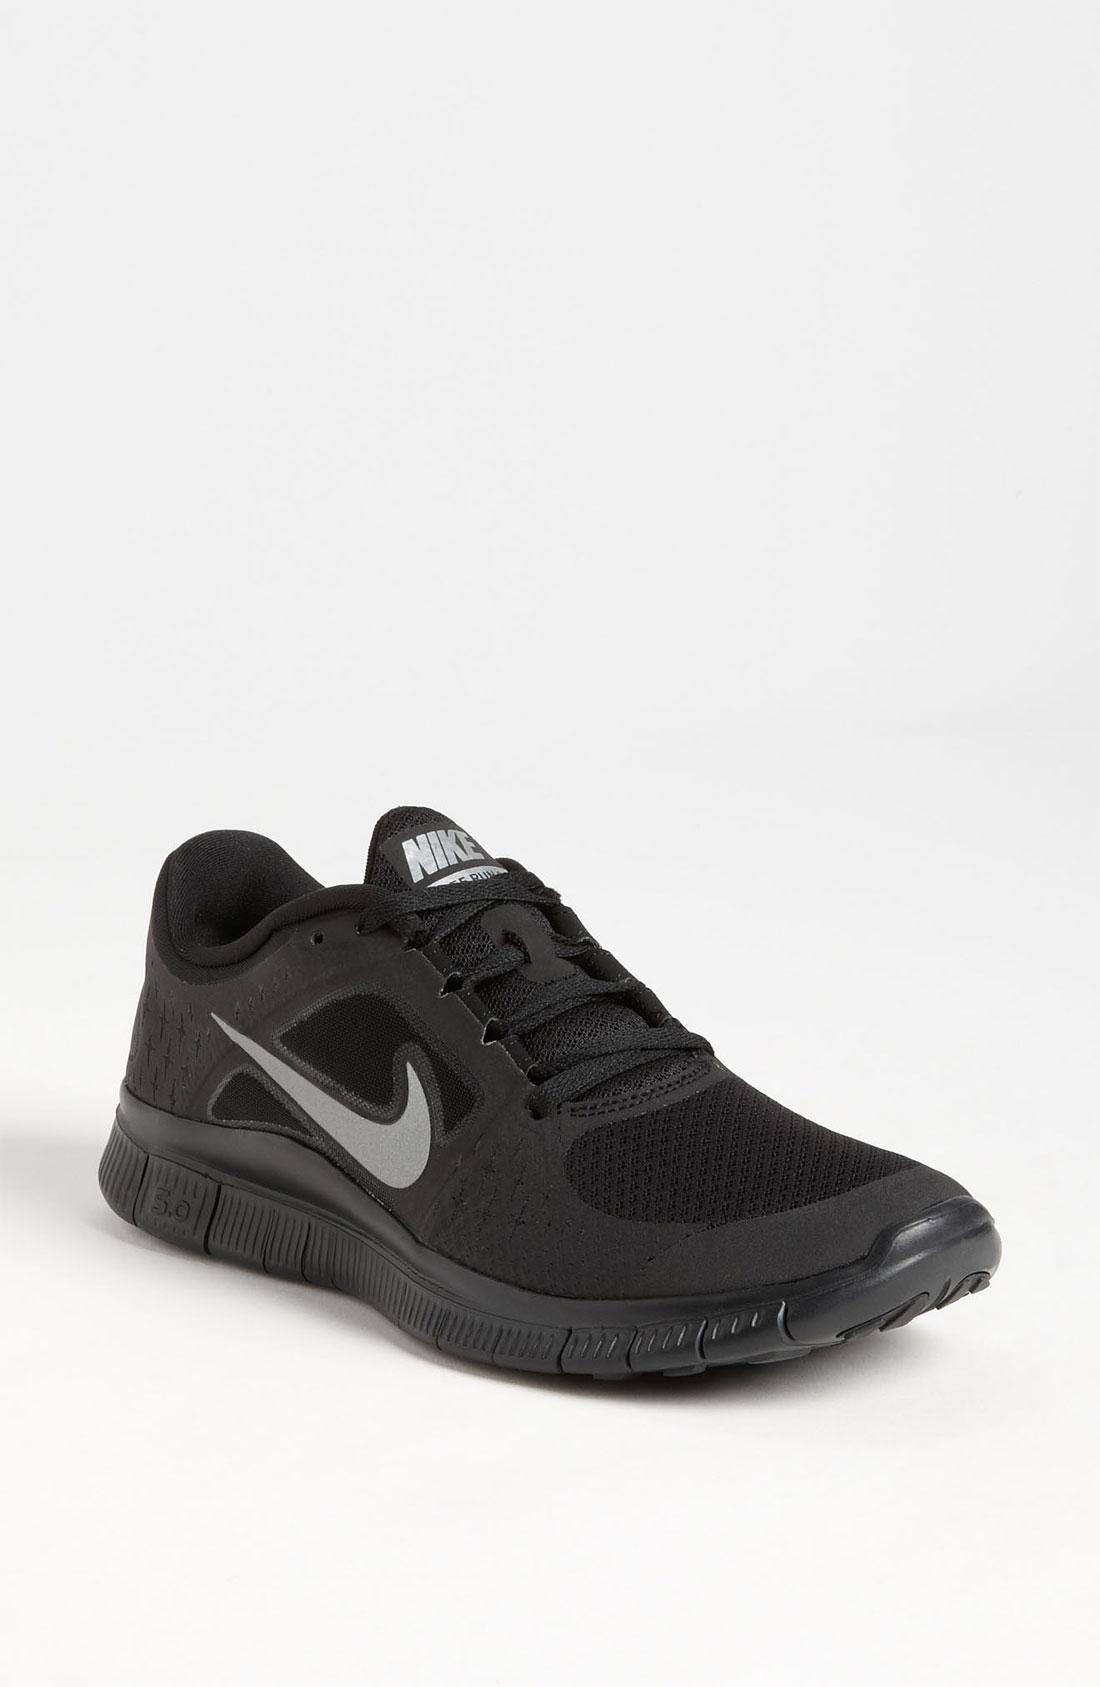 Nike Free Run 3 5.0 Reviews